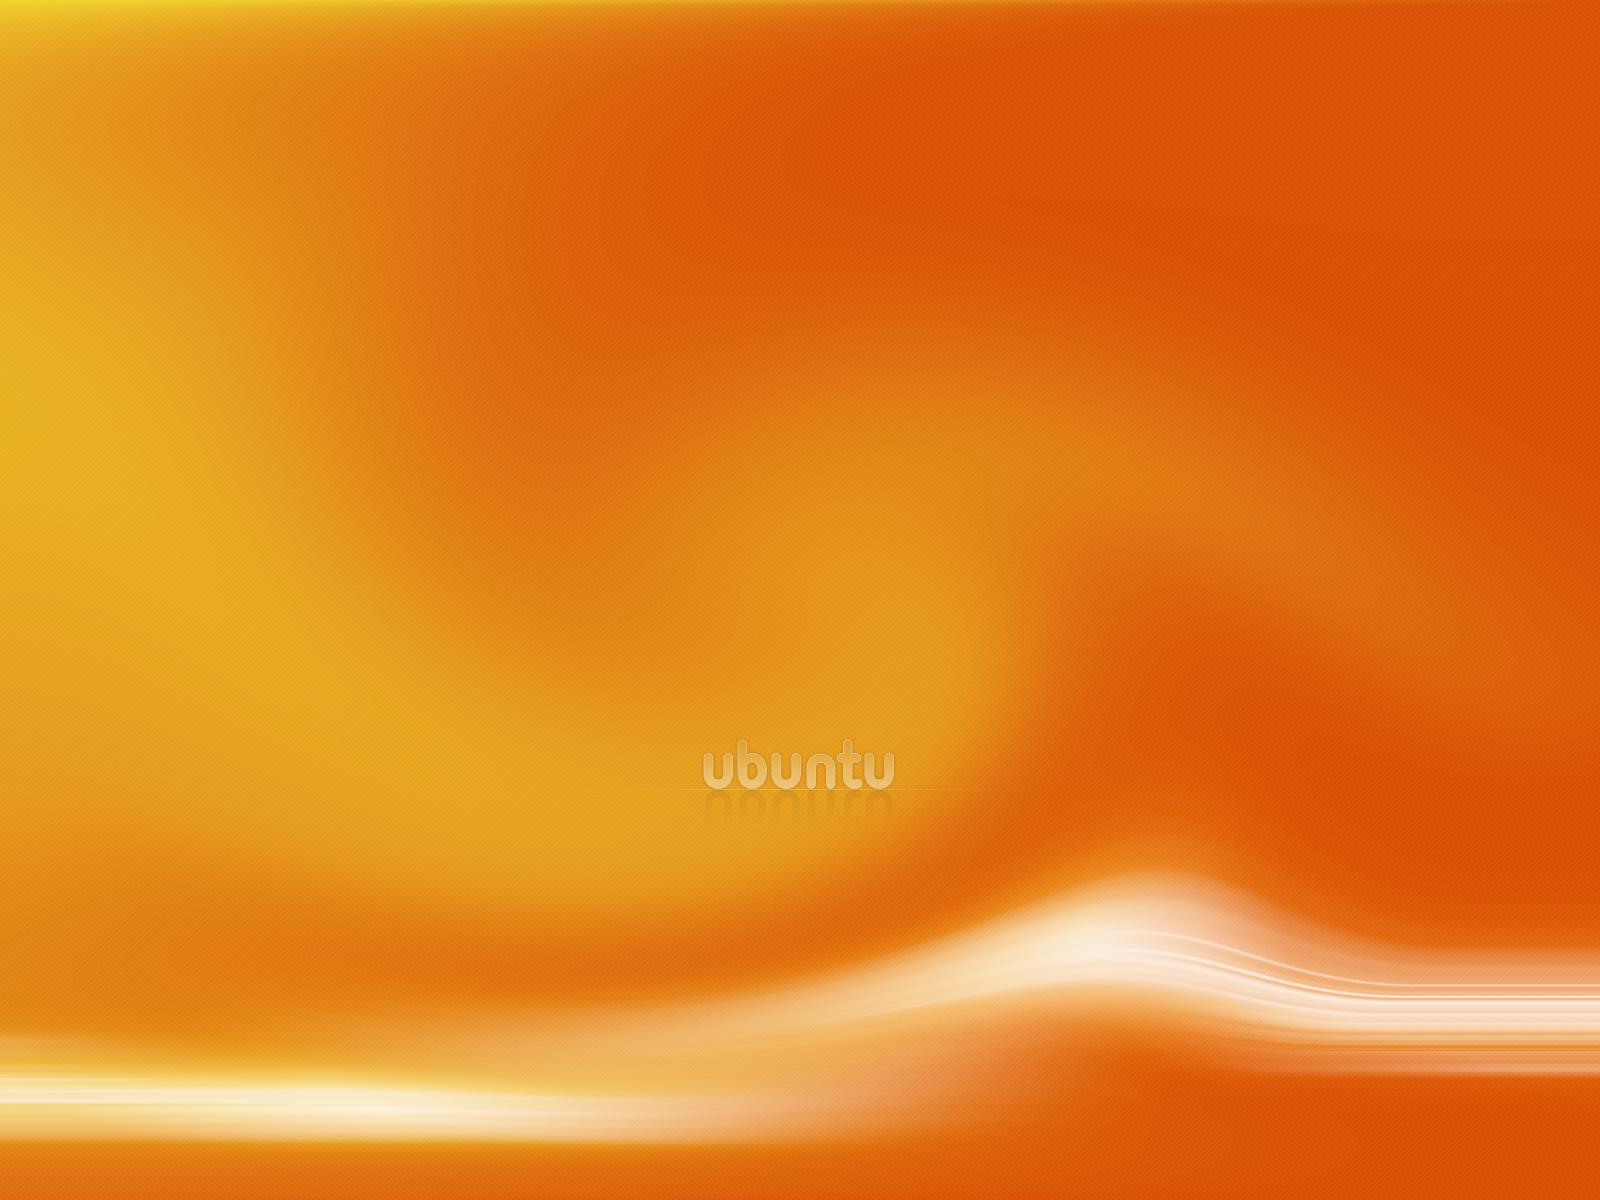 Orange Ubuntu